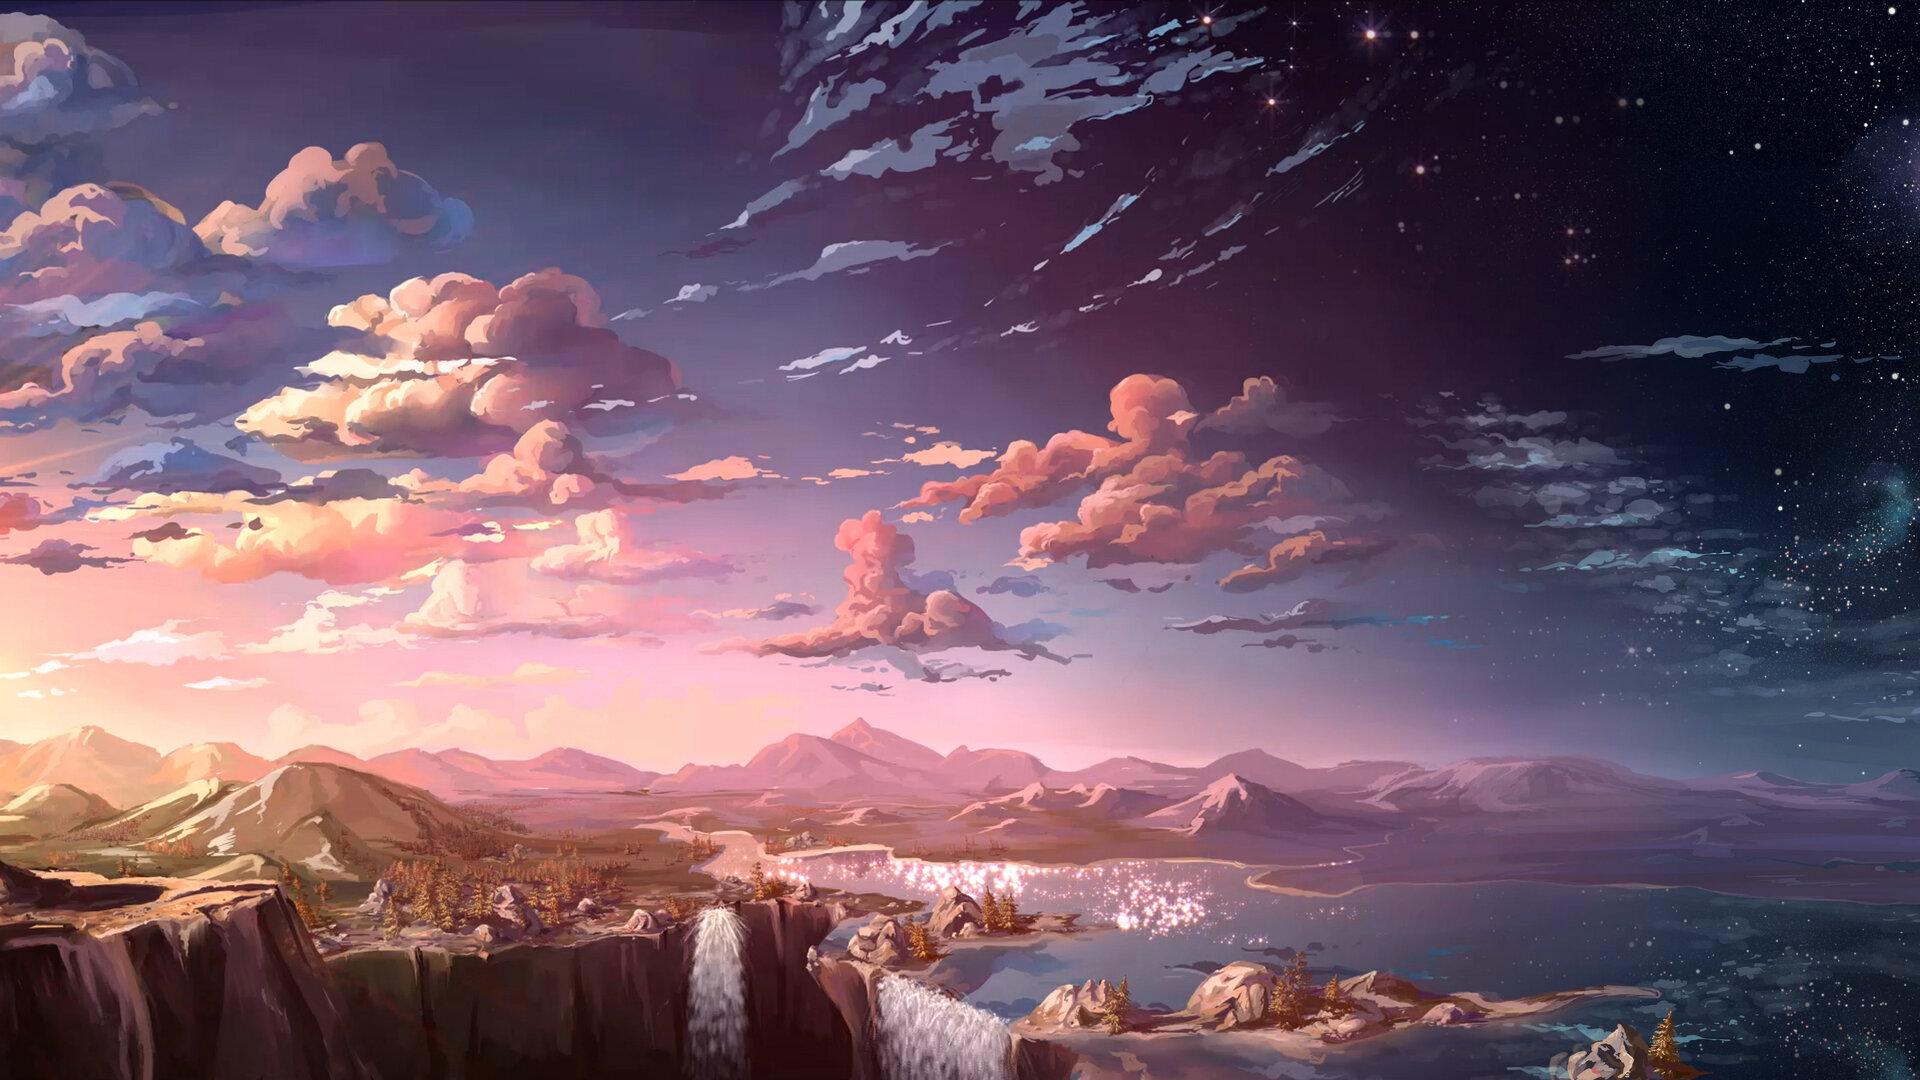 1920x1080 anime landscape waterfall cloud 5k laptop full - Anime 1920x1080 ...